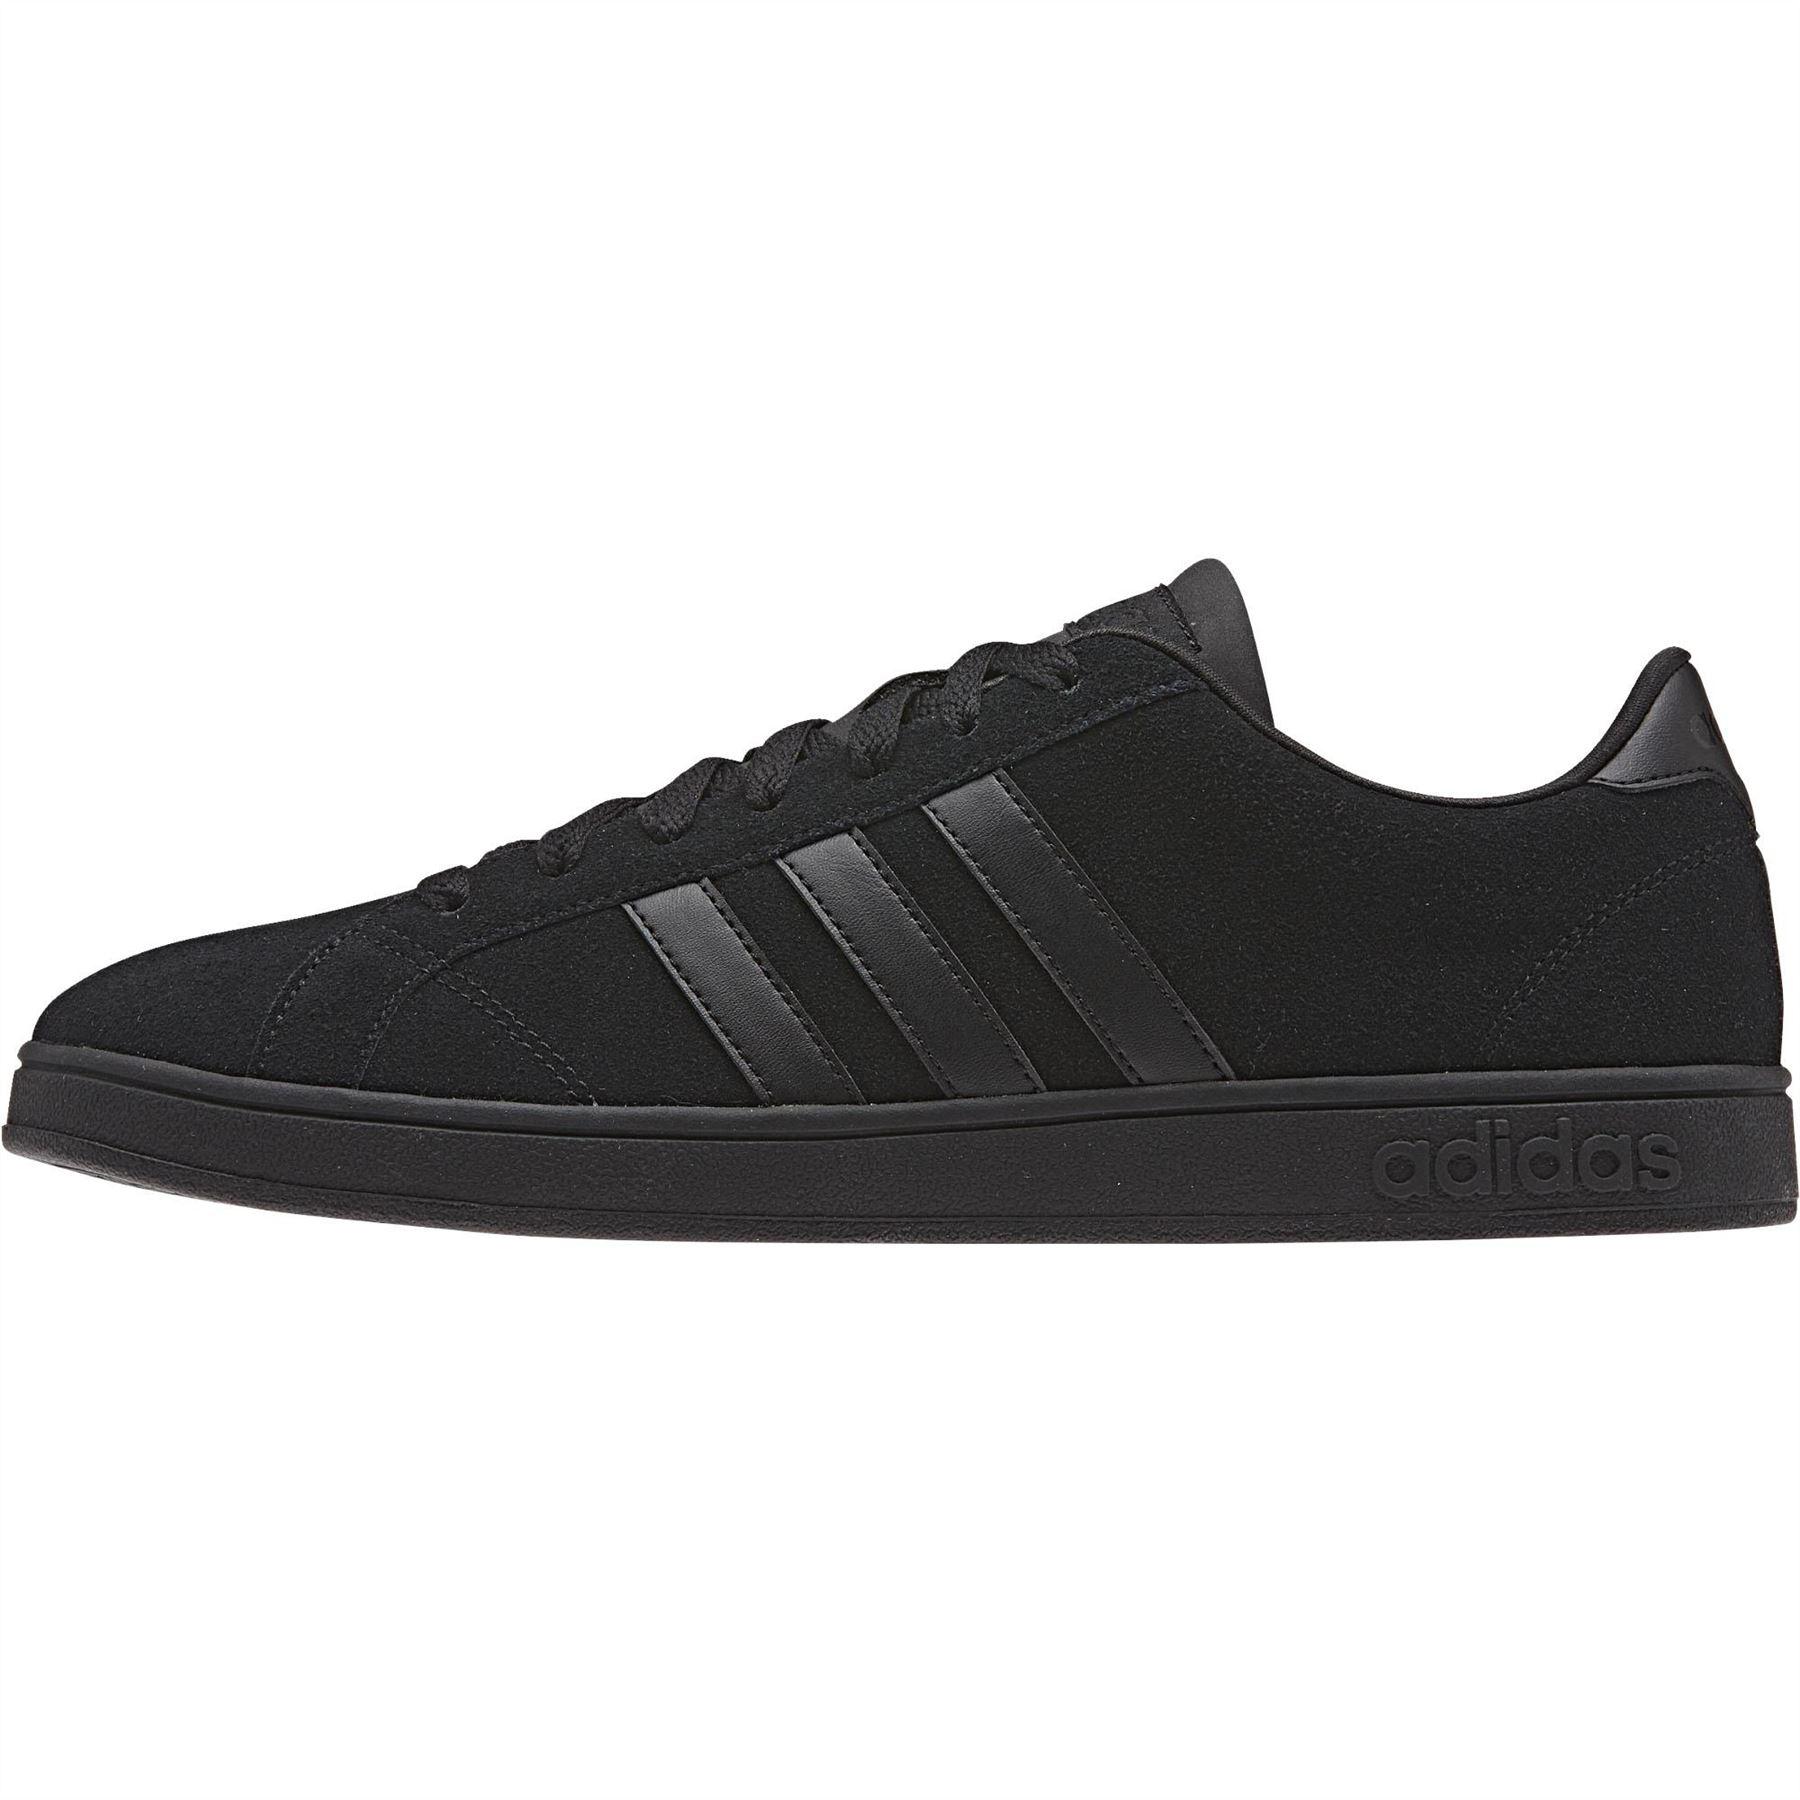 ... adidas neo Baseline Trainers Mens Black Casual Fashion Sneakers Shoes  ... fe8aae3e0e8